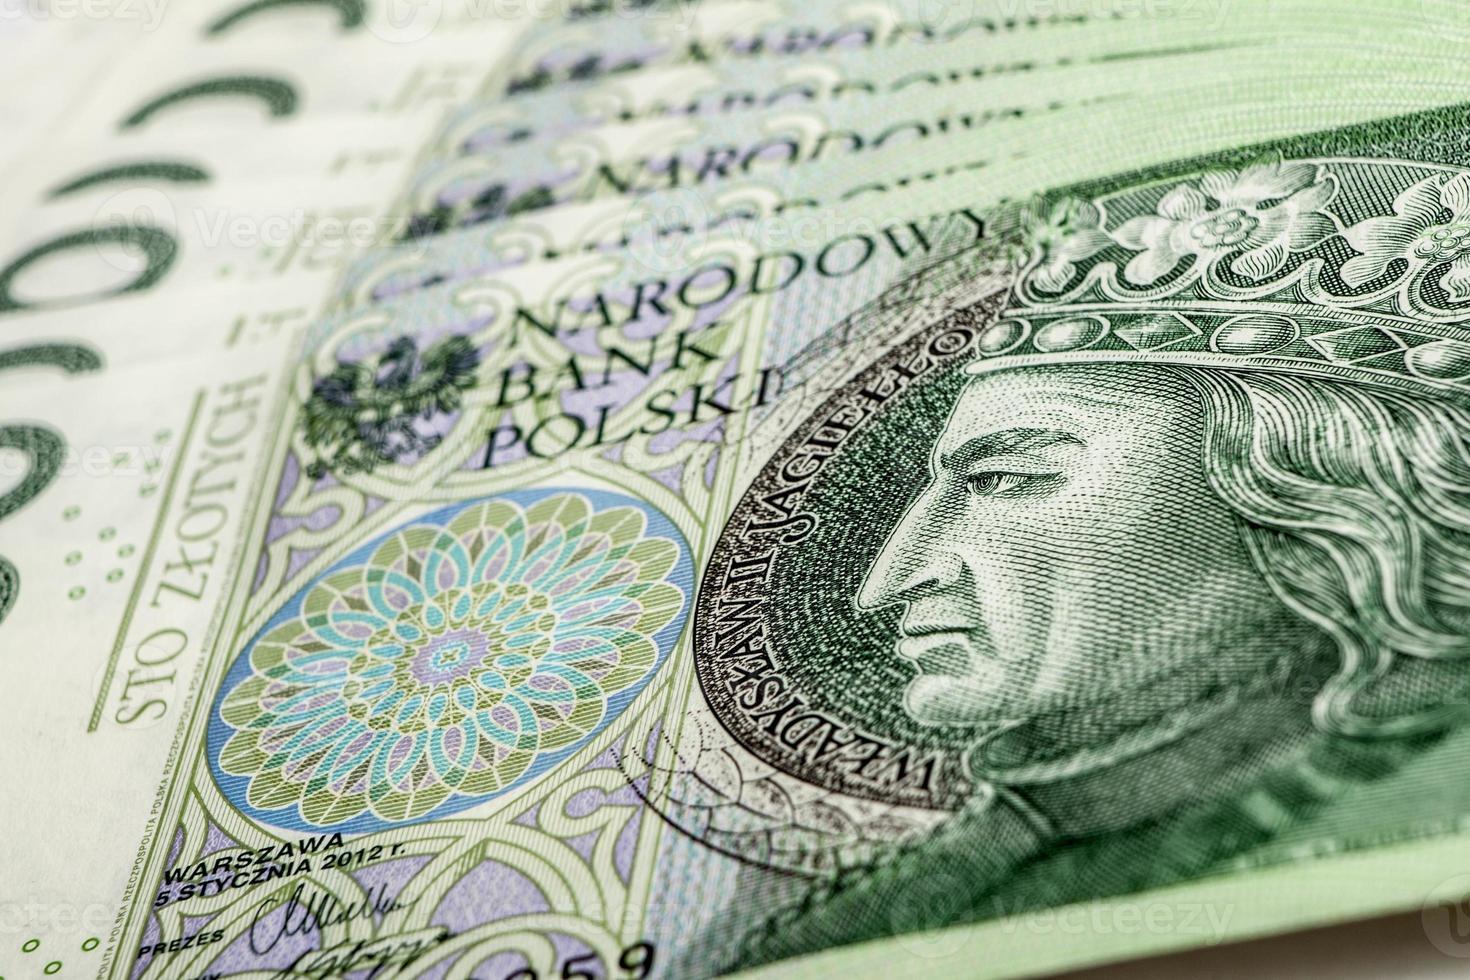 bankbiljet 100 pln - Poolse zloty foto